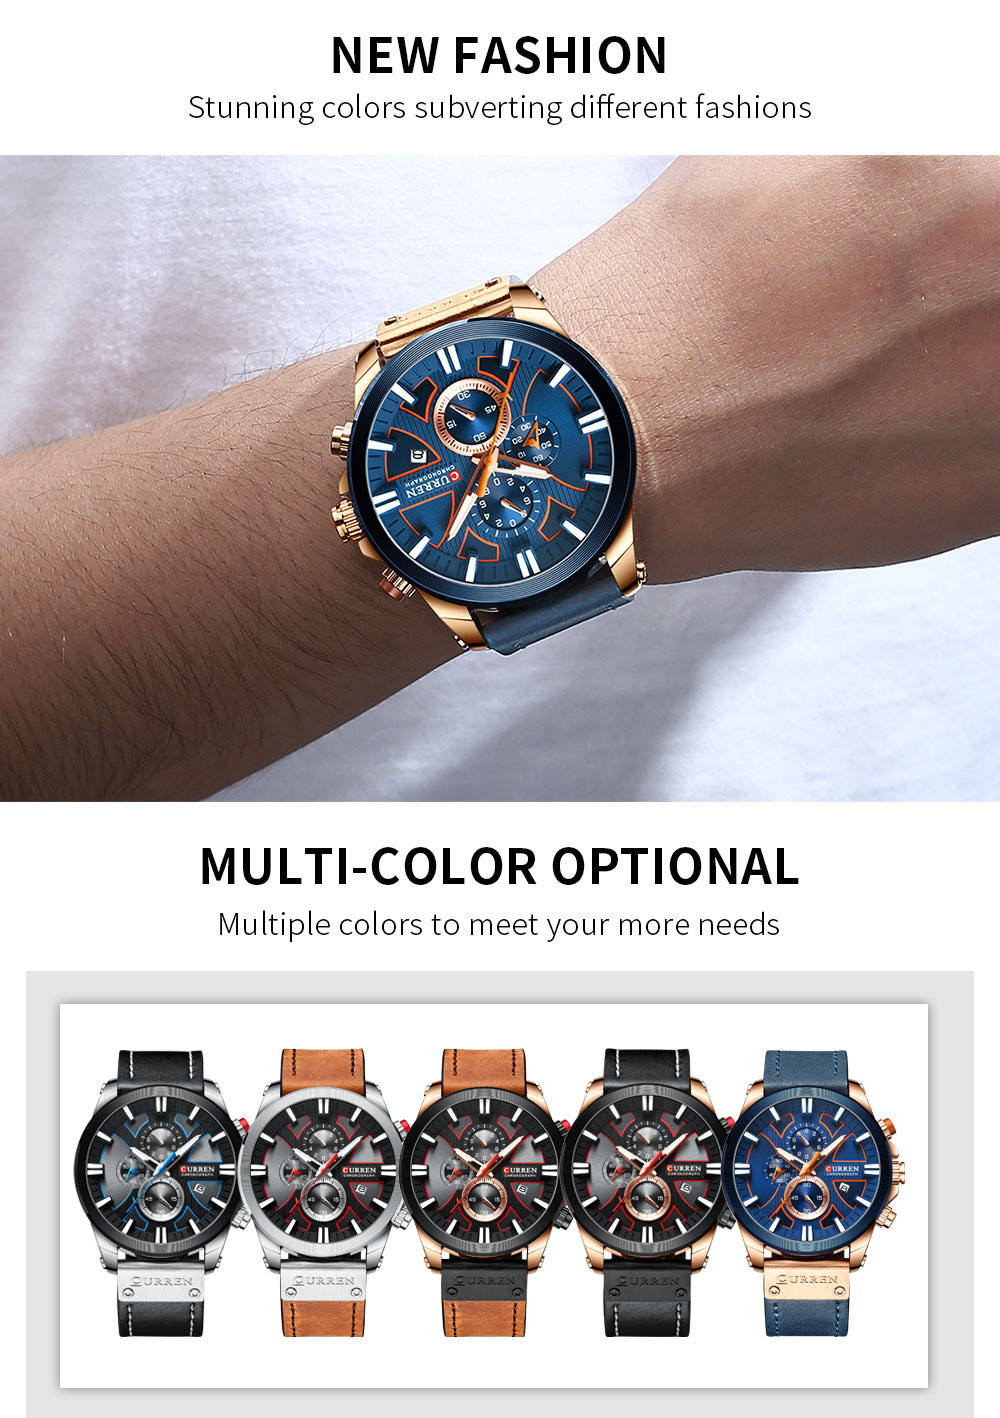 Hbef7ea94f70e46749cd1e5aafb4441d3p CURREN  Brand Luxury Men Watch Leather Quartz Clock Fashion Chronograph Wristwatch Male Sport Military 8346 Relogio Masculino